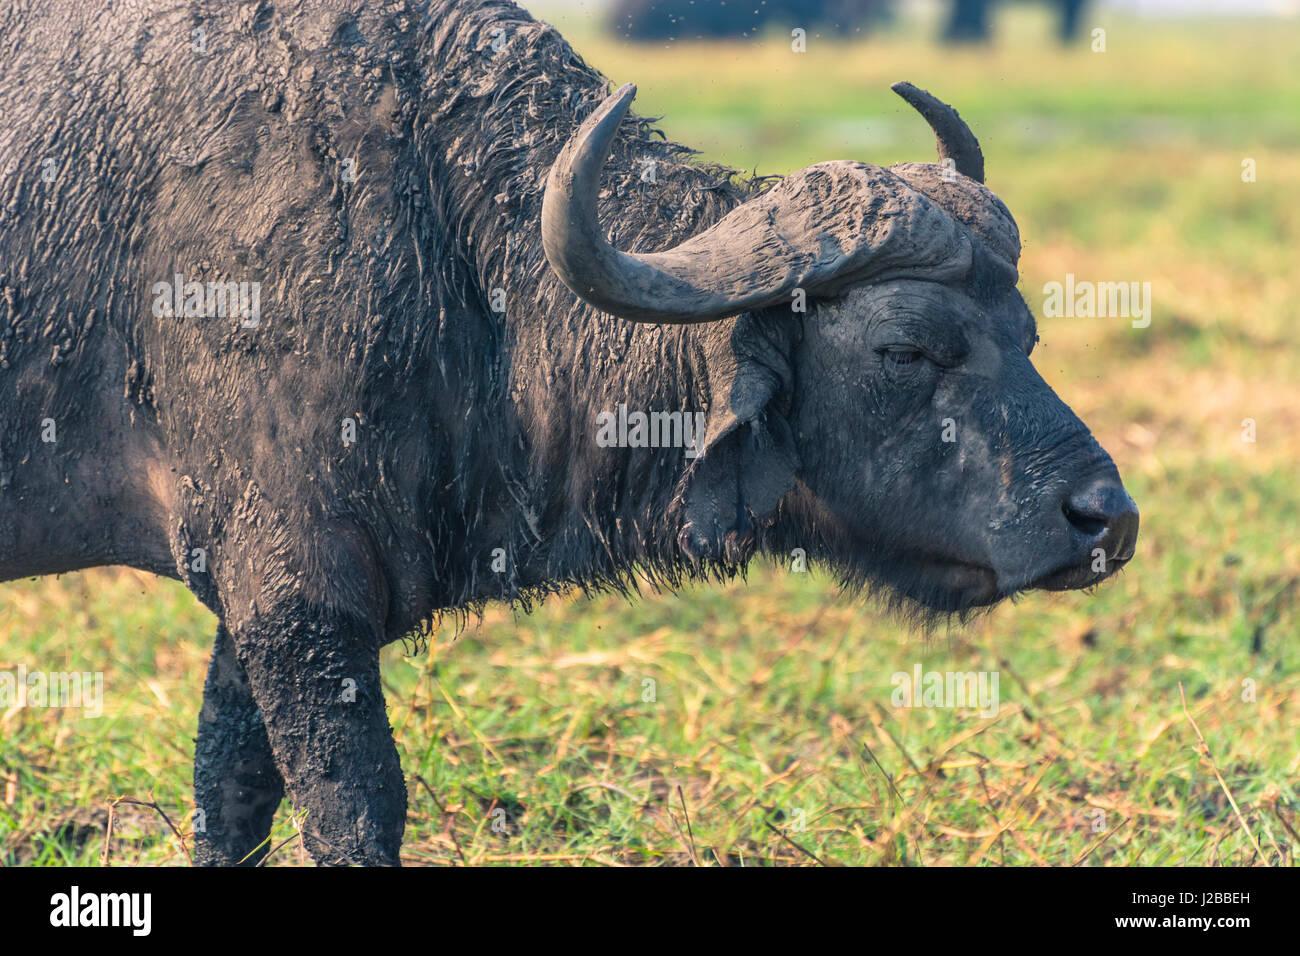 Botswana. Chobe National Park. Old male Cape Buffalo (Syncerus caffer) on the shore of the Chobe river. - Stock Image